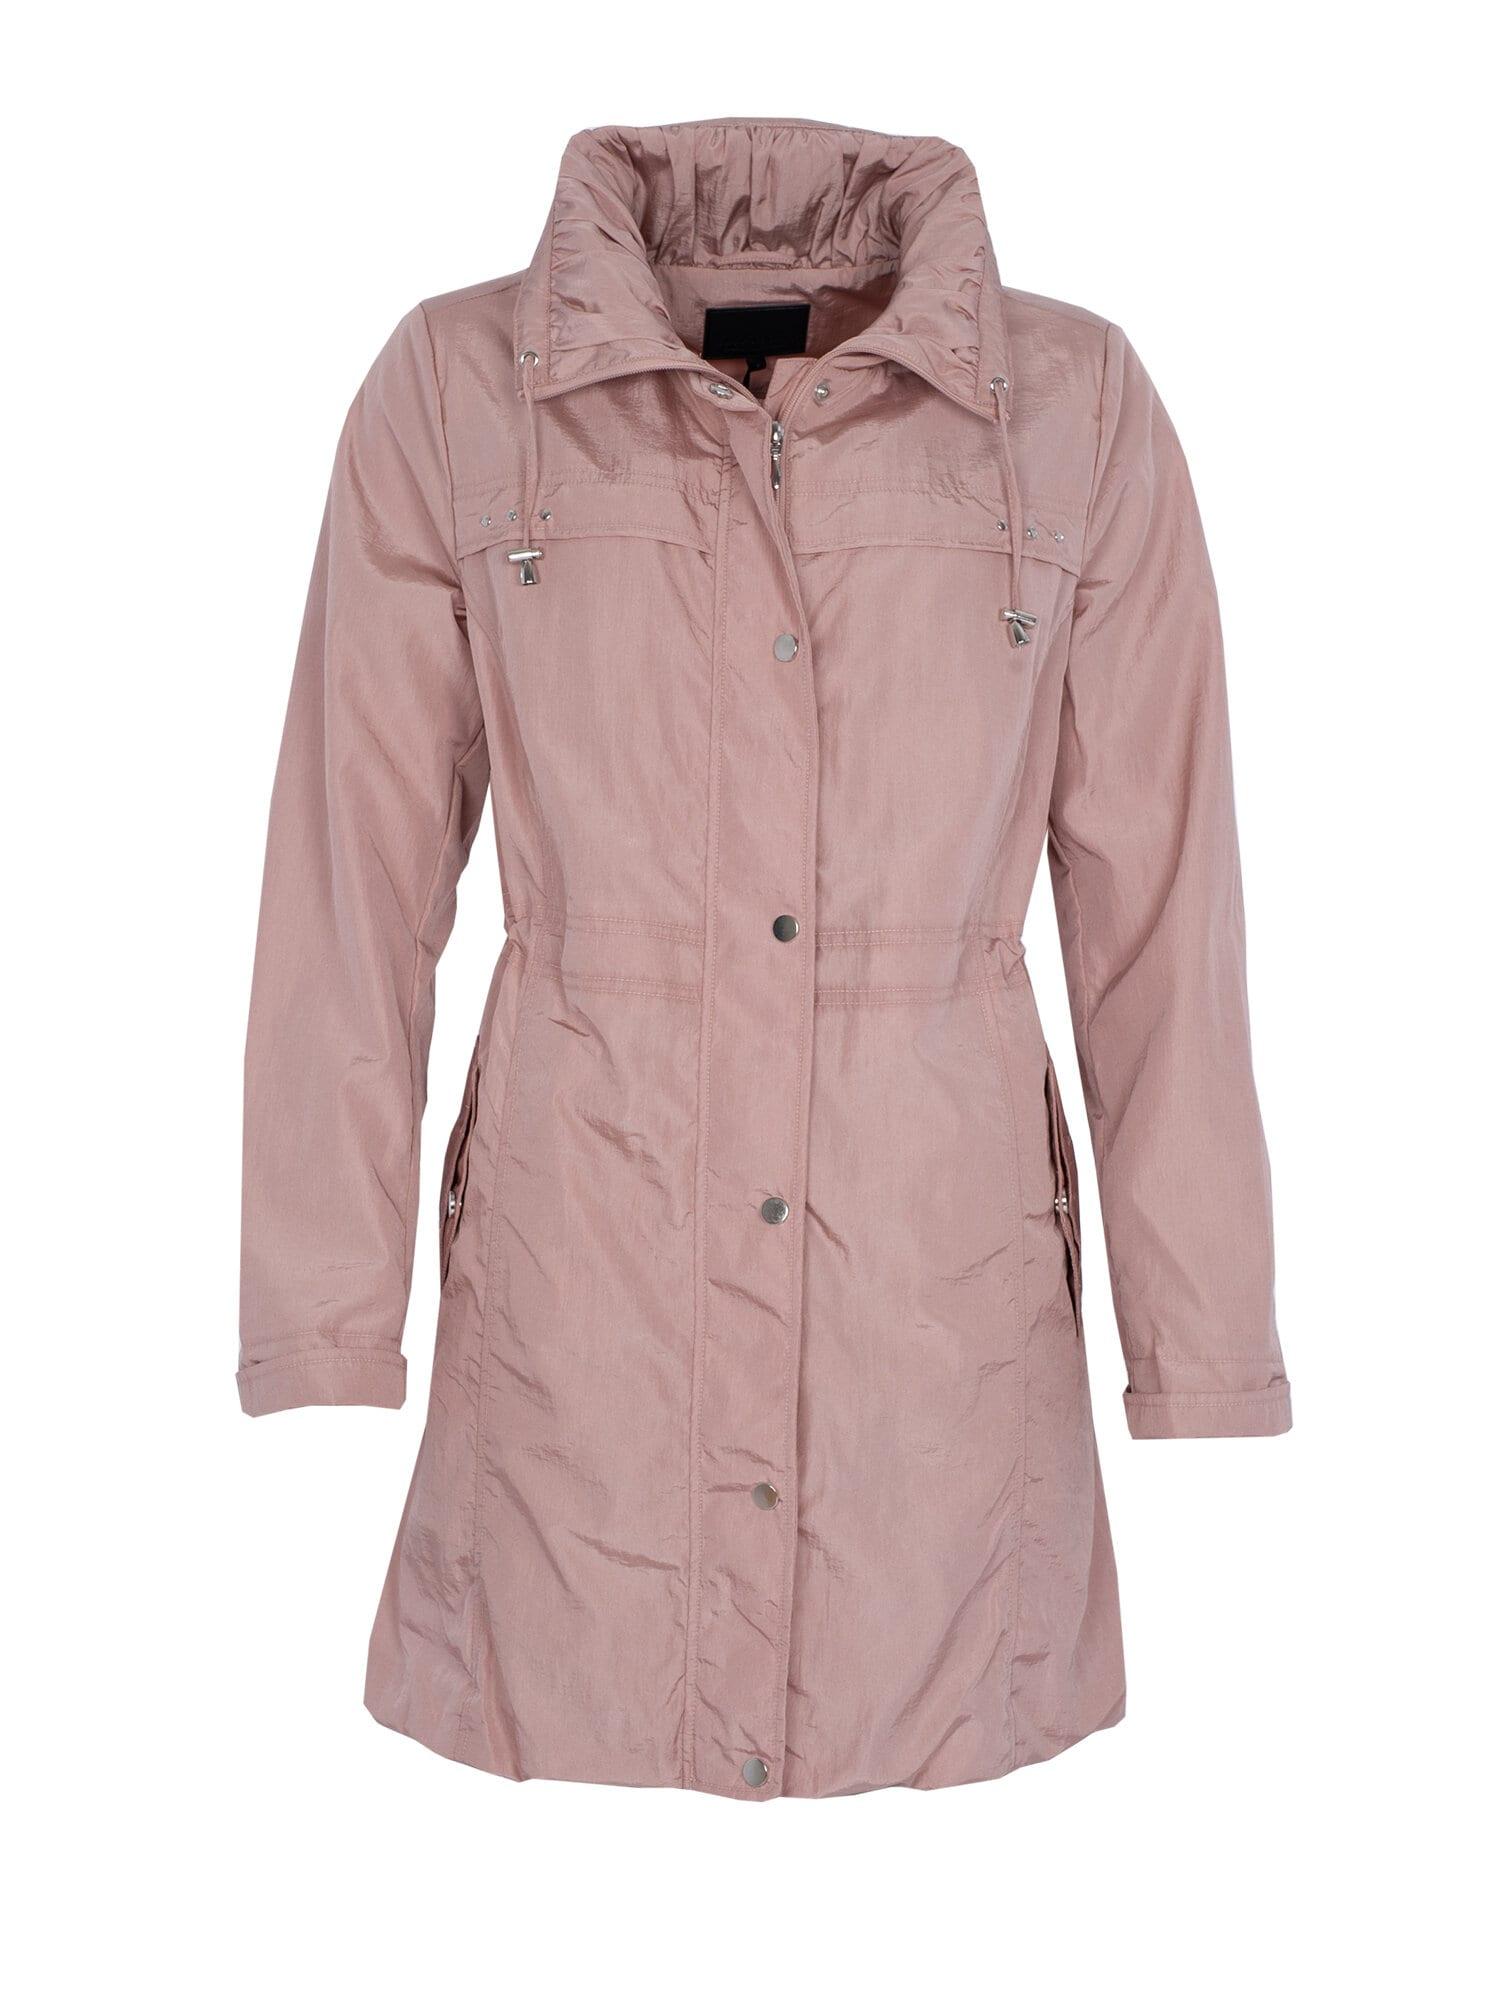 Judit coat Bionic Finish Eco - Dusty Pink